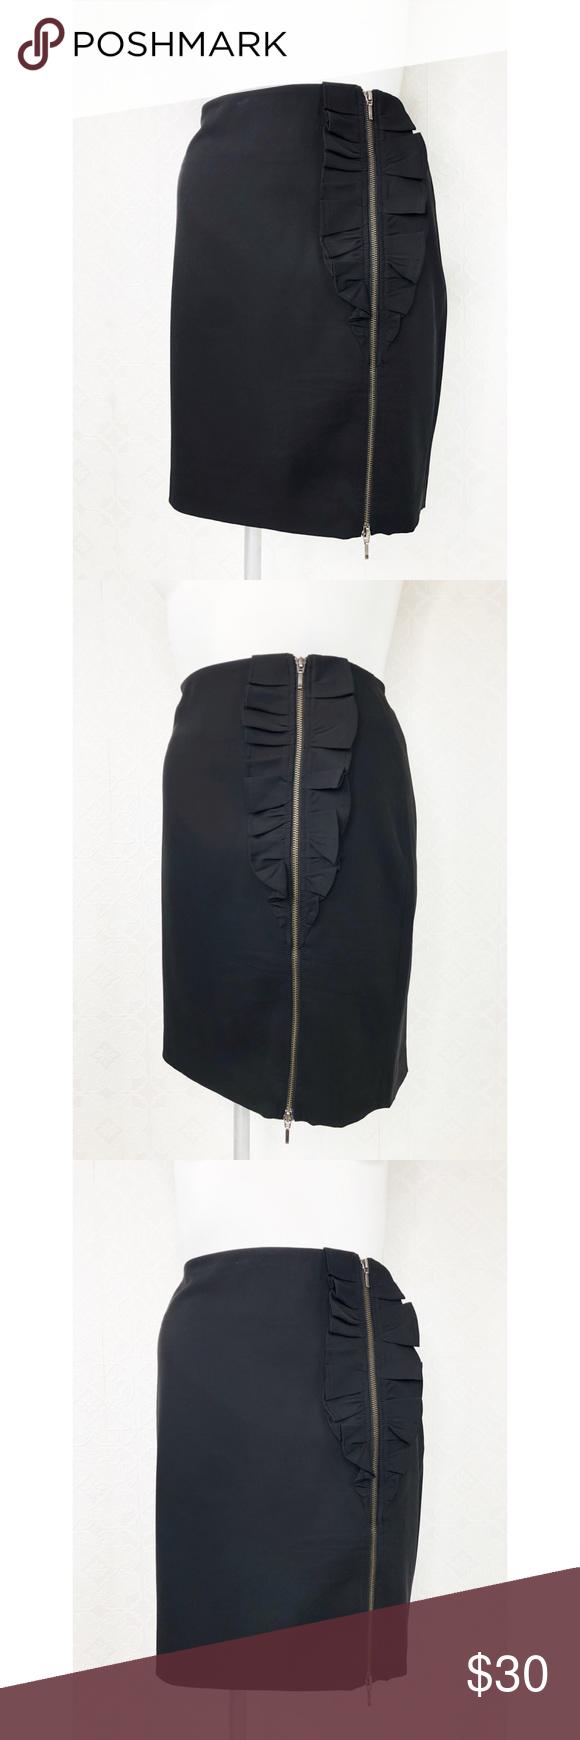 💜Banana Republic Black Ruffle Zipper Skirt Banana Republic  Size 14  Black skirt  Ruffle front with full zipper  Excellent pre loved condition  W5 #0383 Banana Republic Skirts